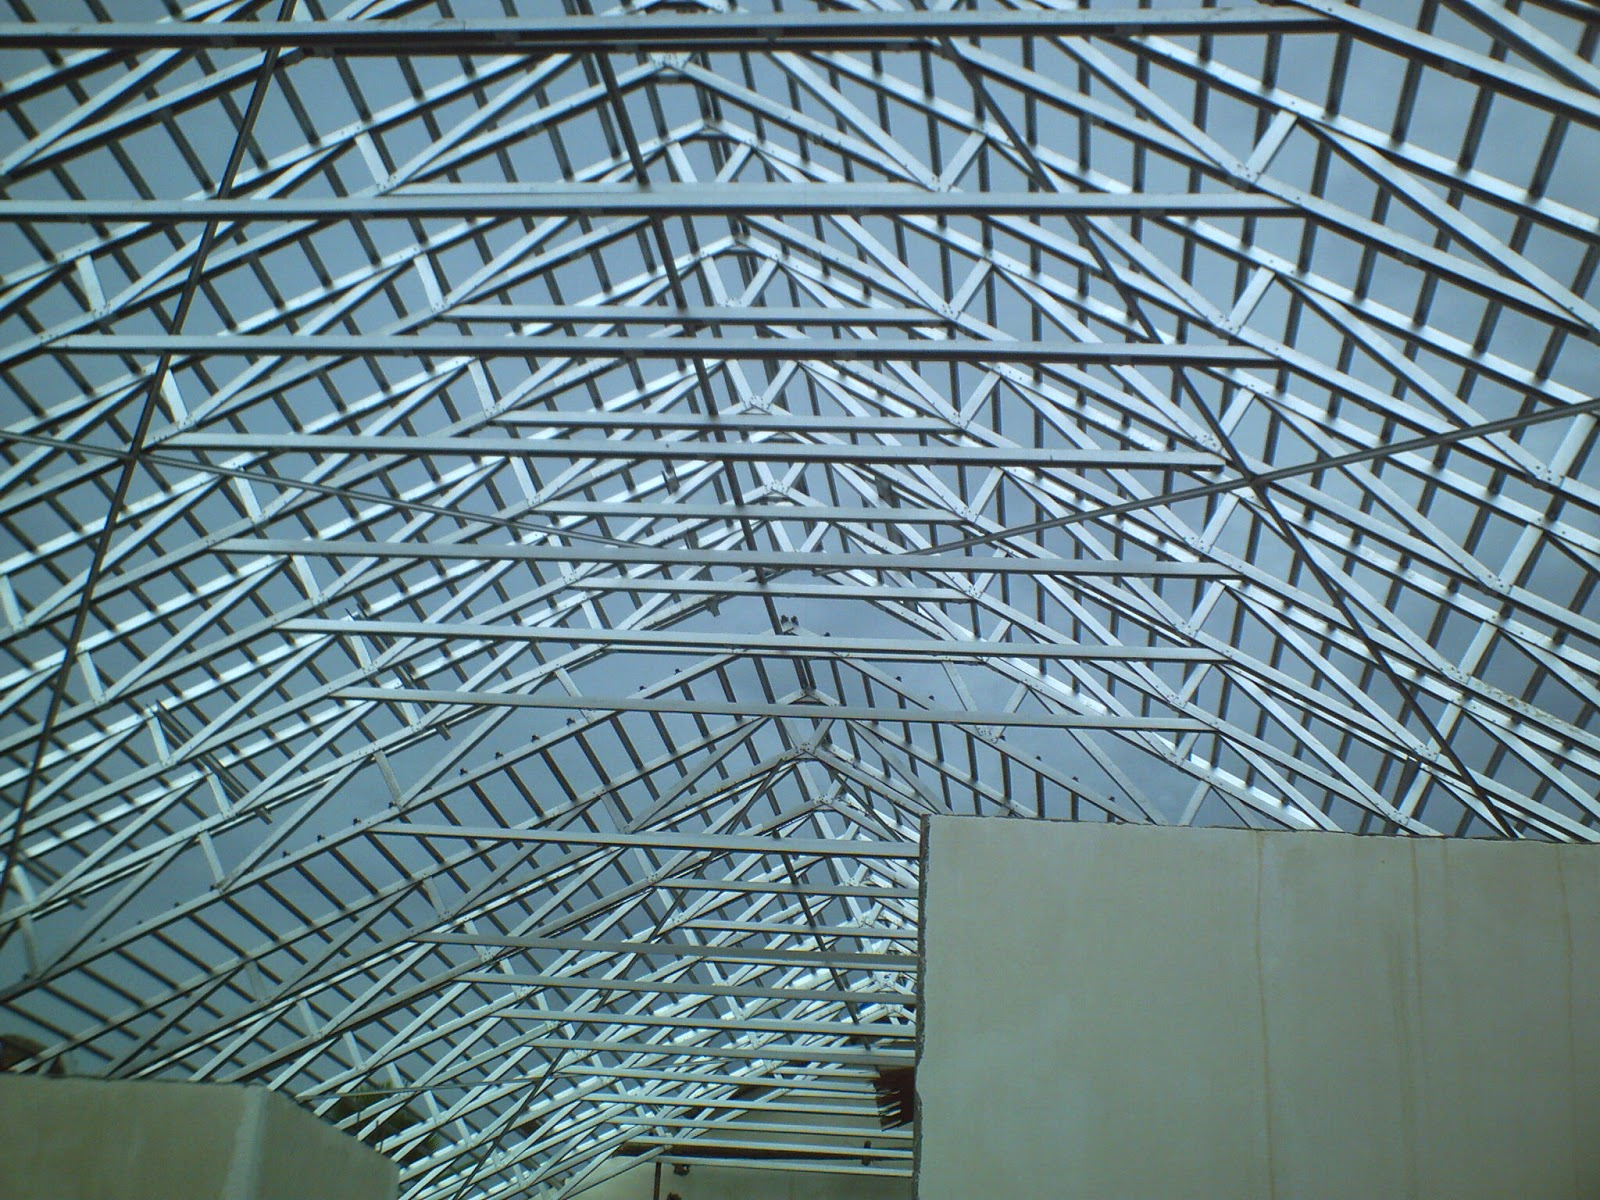 harga rangka atap baja ringan di malang analisis perbandingan konstruksi kayu dan ...